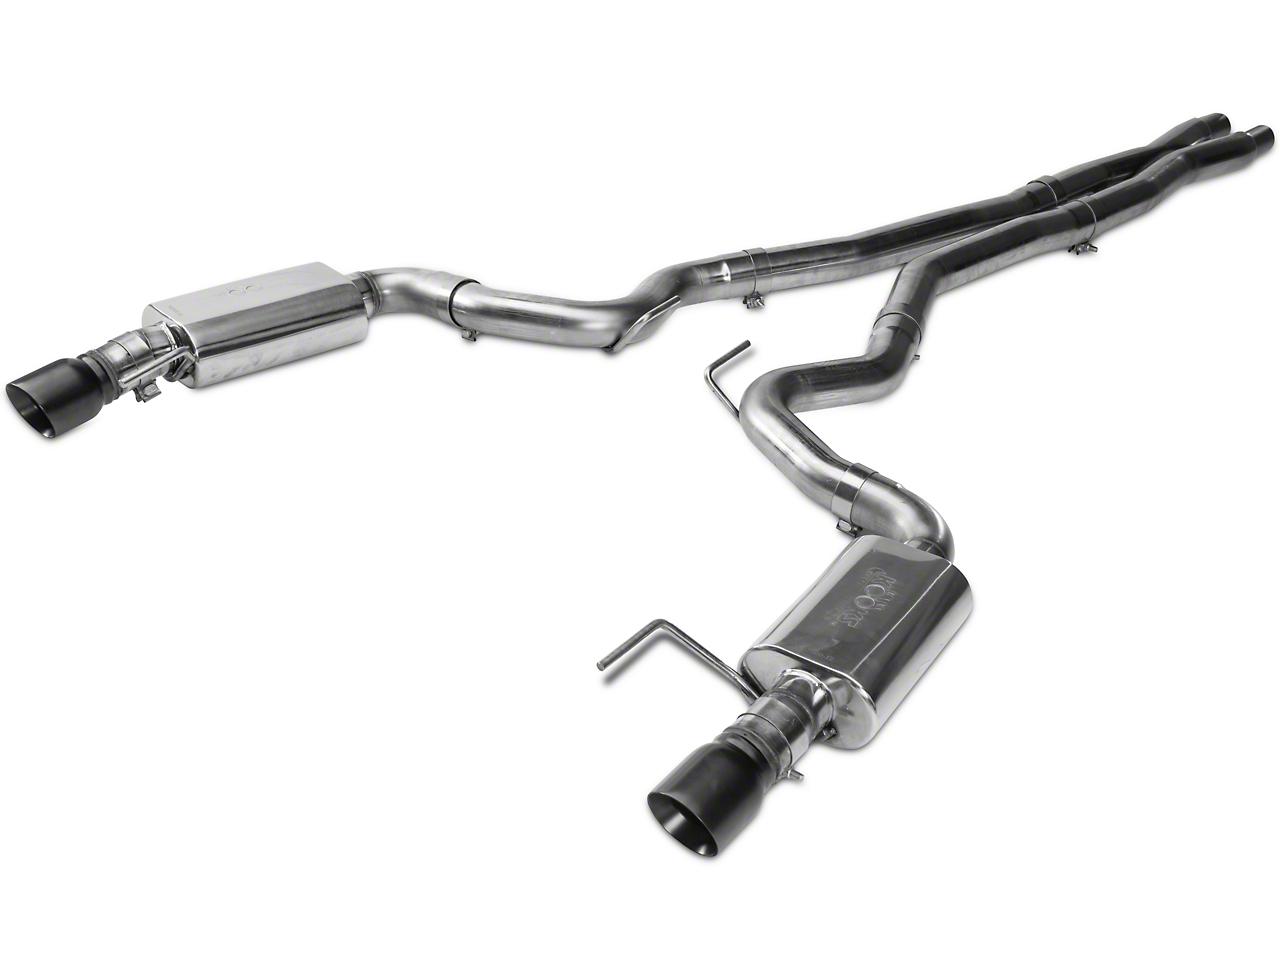 Kooks Cat-Back Exhaust w/ X-Pipe - Black Tips (15-17 GT Fastback)